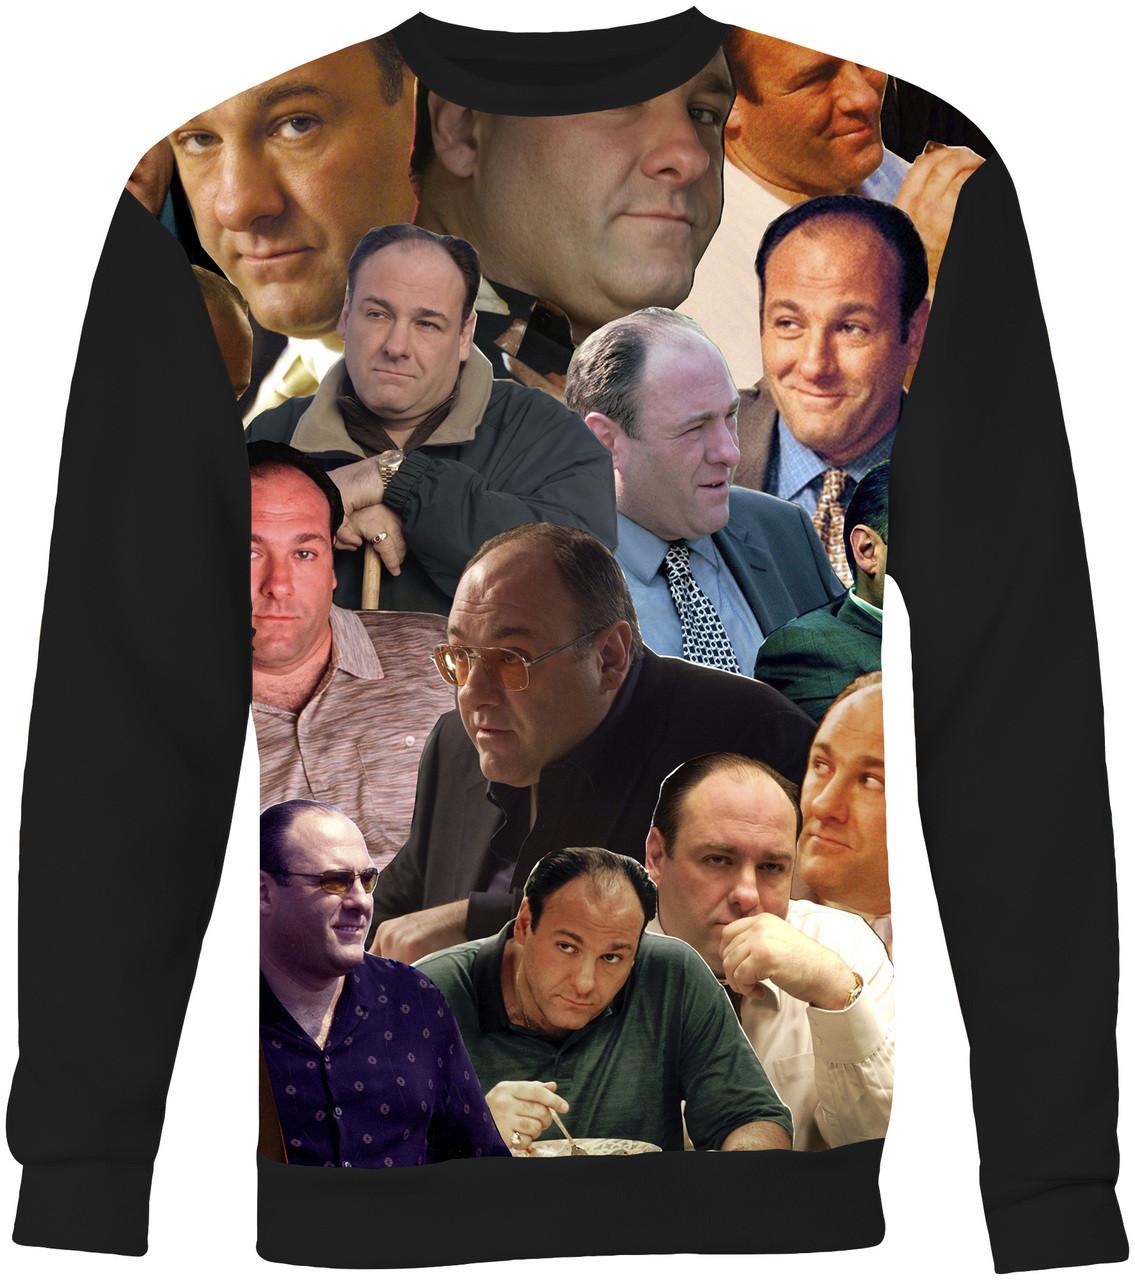 Tony Soprano Photo Collage T-Shirt The Sopranos